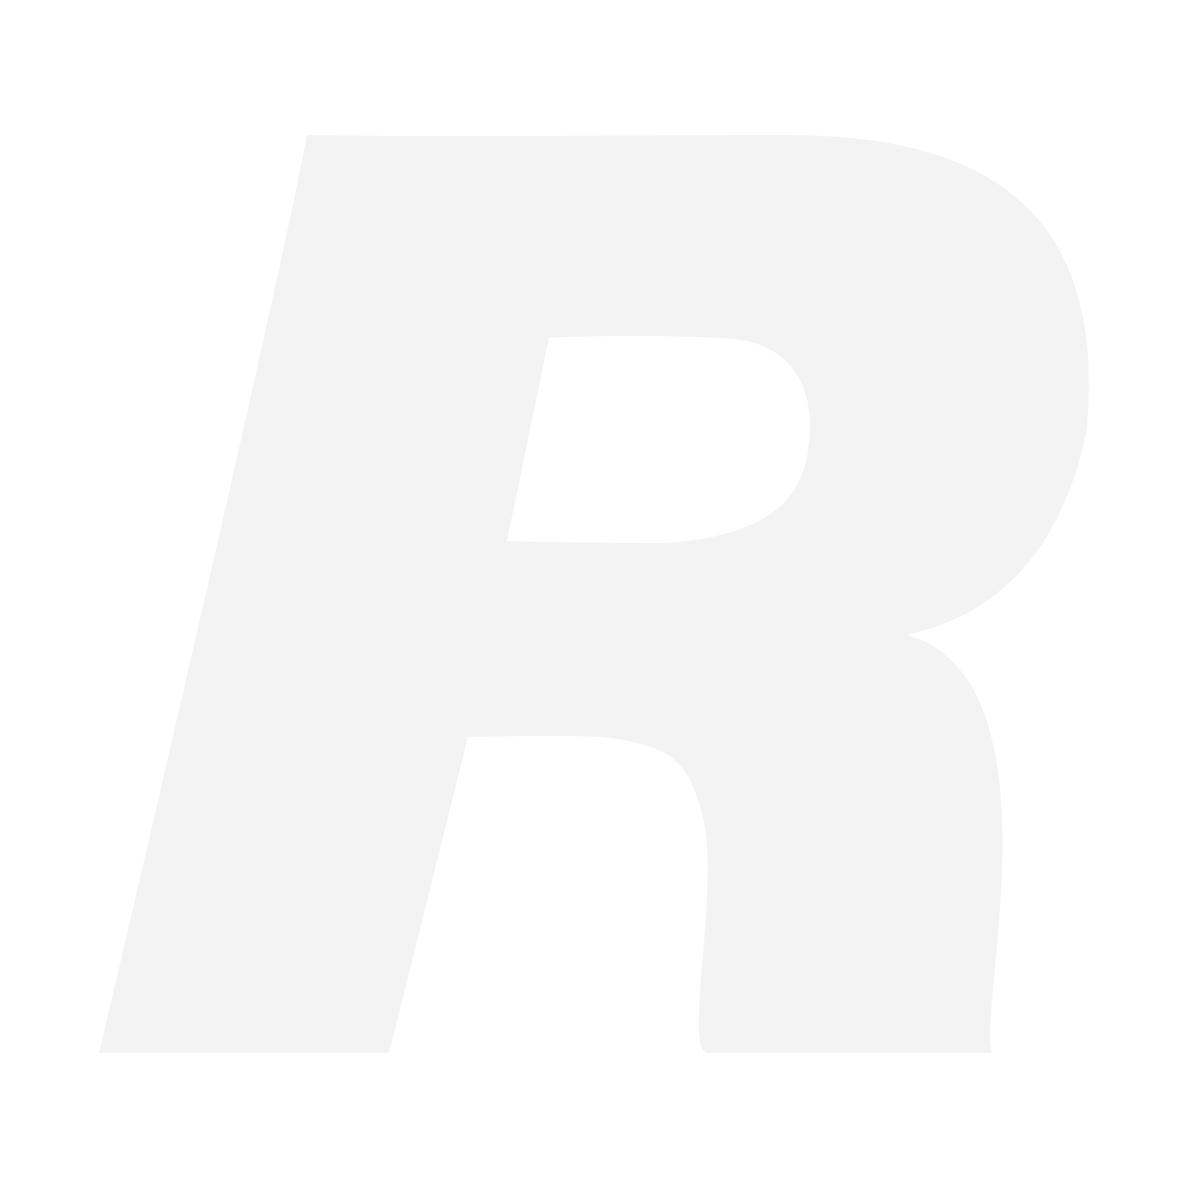 "Eizo ColorEdge CS2420 24.1"" -kuvankäsittelymonitori"